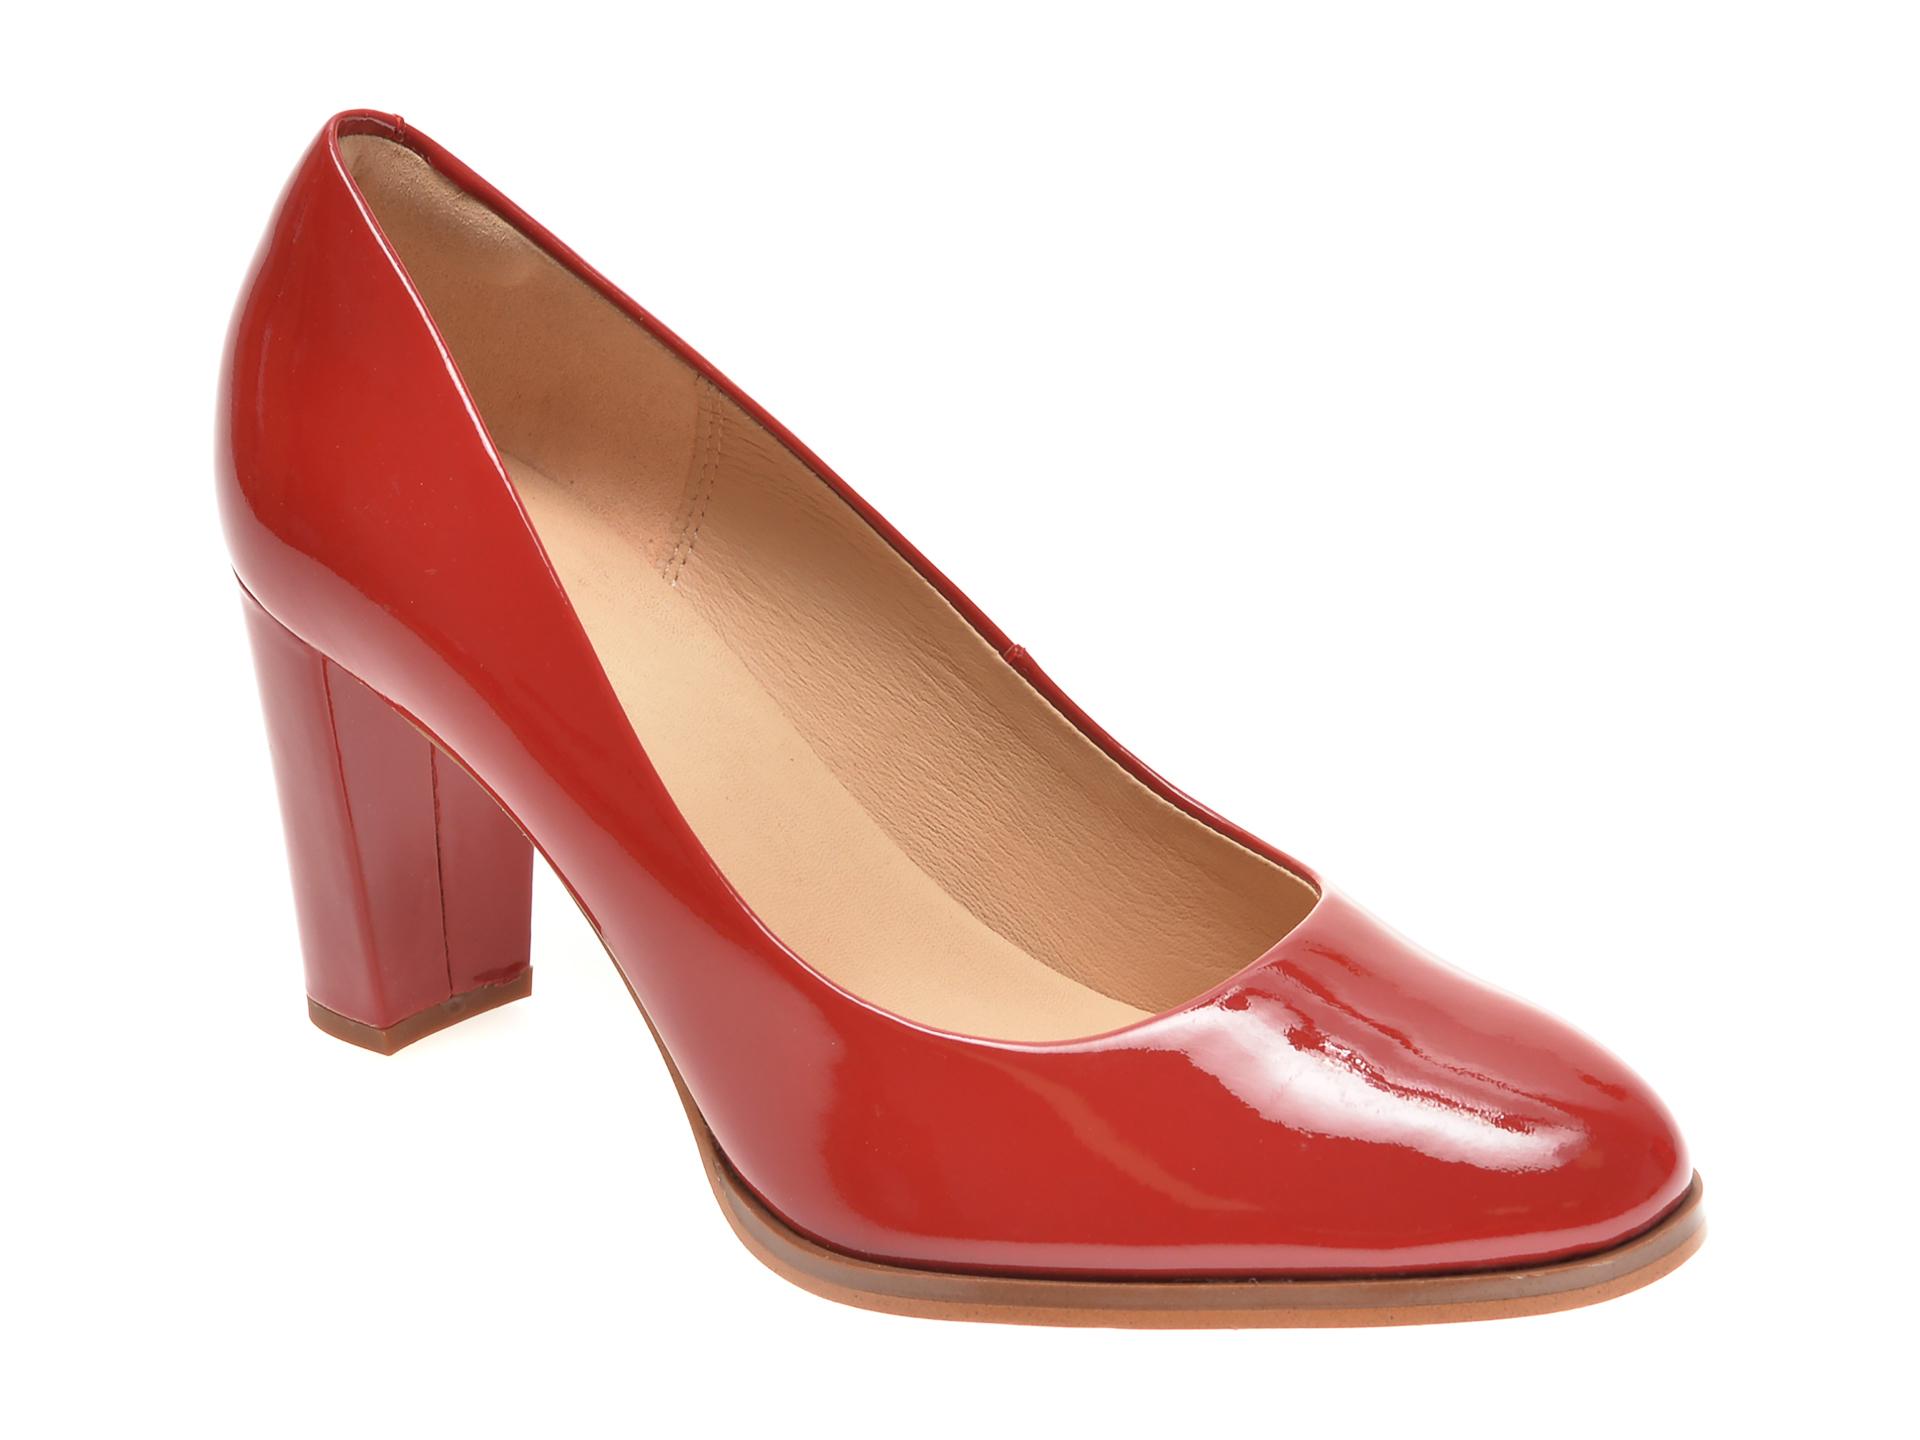 Pantofi CLARKS rosii, KAYLIN CARA, din piele naturala lacuita imagine